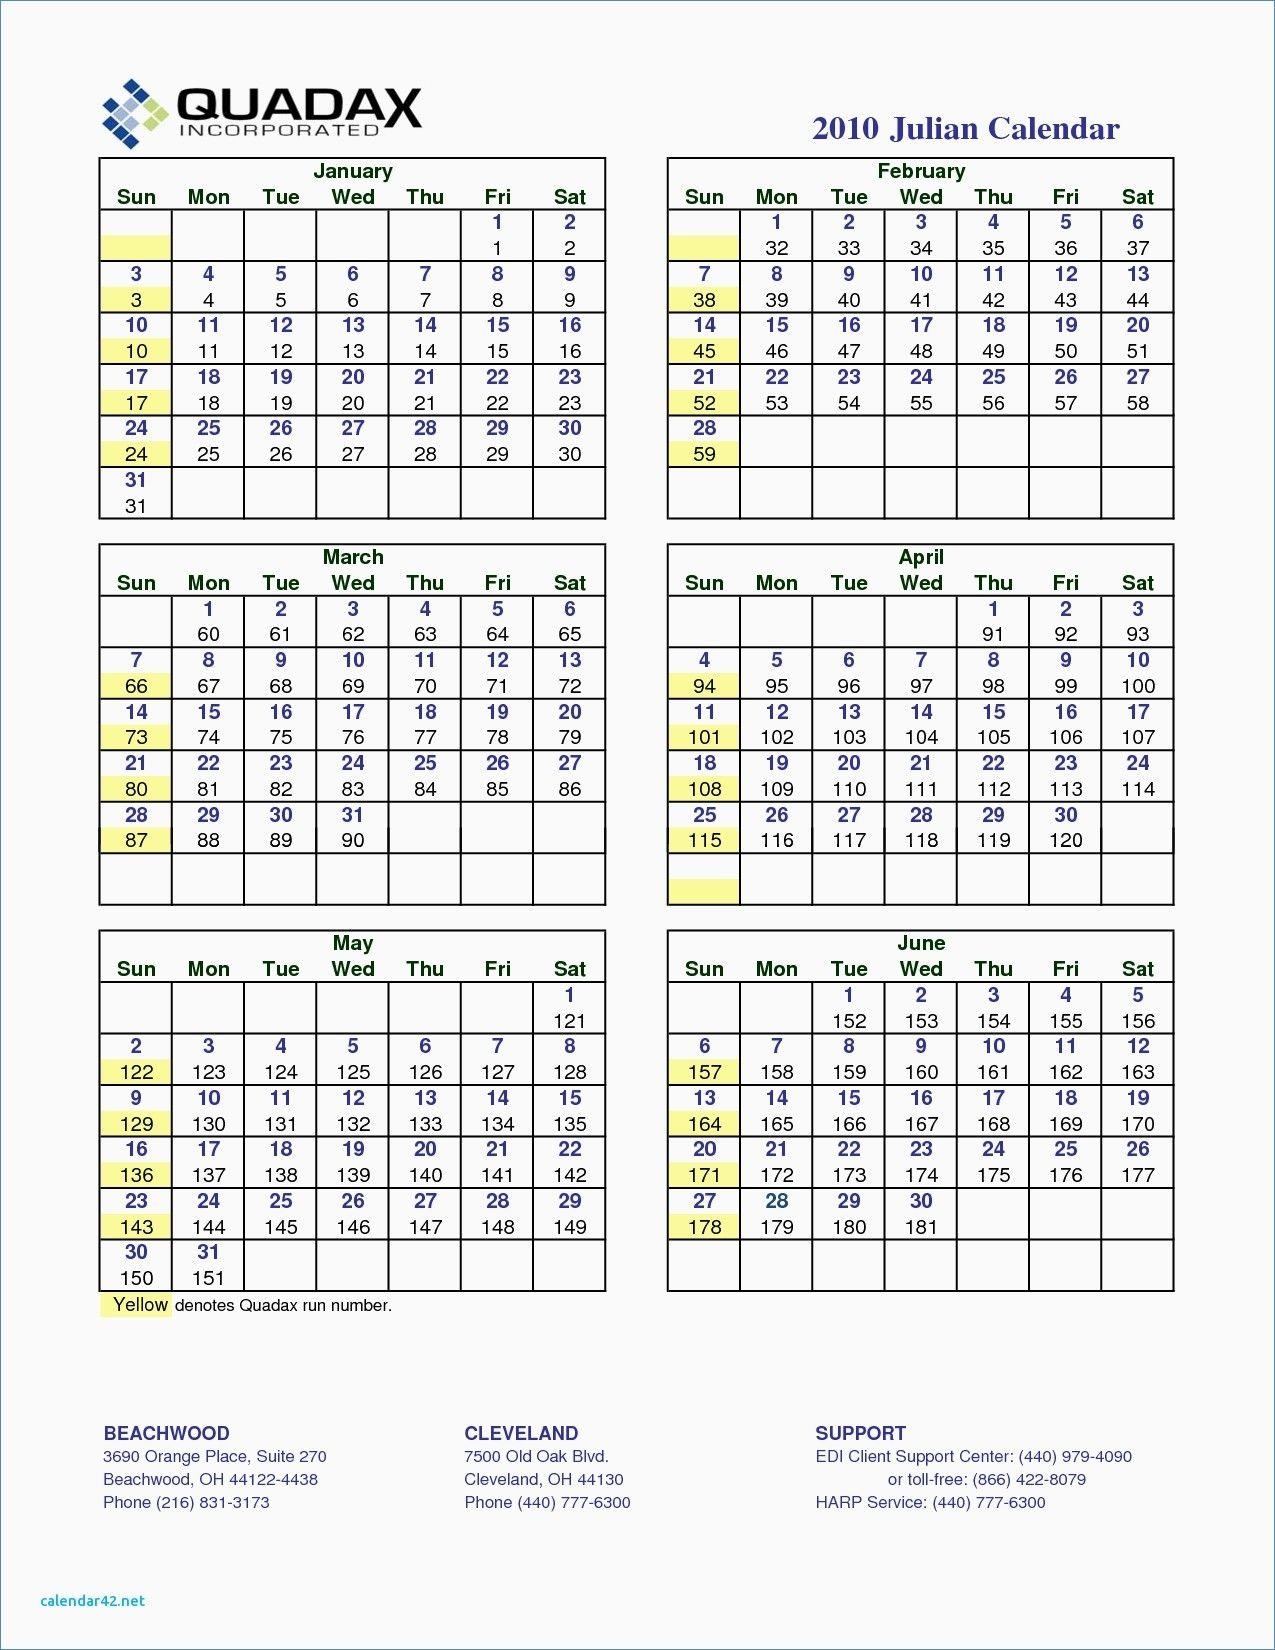 Julian Calendar 2019 Quadax July 2018 Calendar Sri Lanka Calendar Free Calendar Printables Calendar Marketing Calendar Template